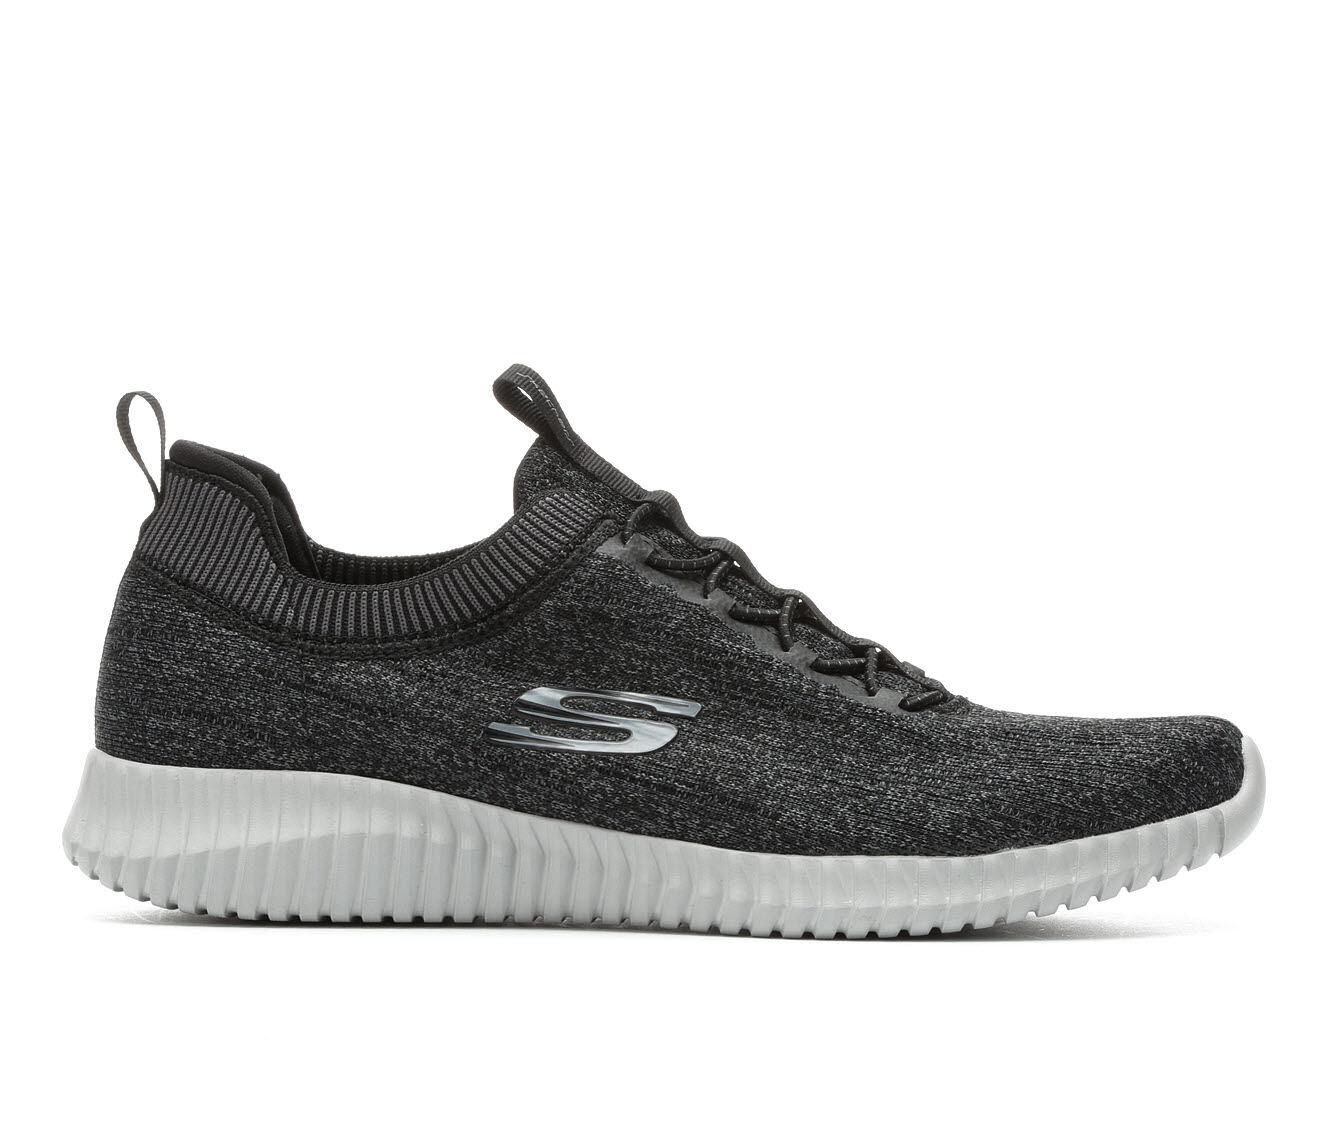 Men's Skechers Hartnell 52642 Slip-On Sneakers Black/Grey/Wht